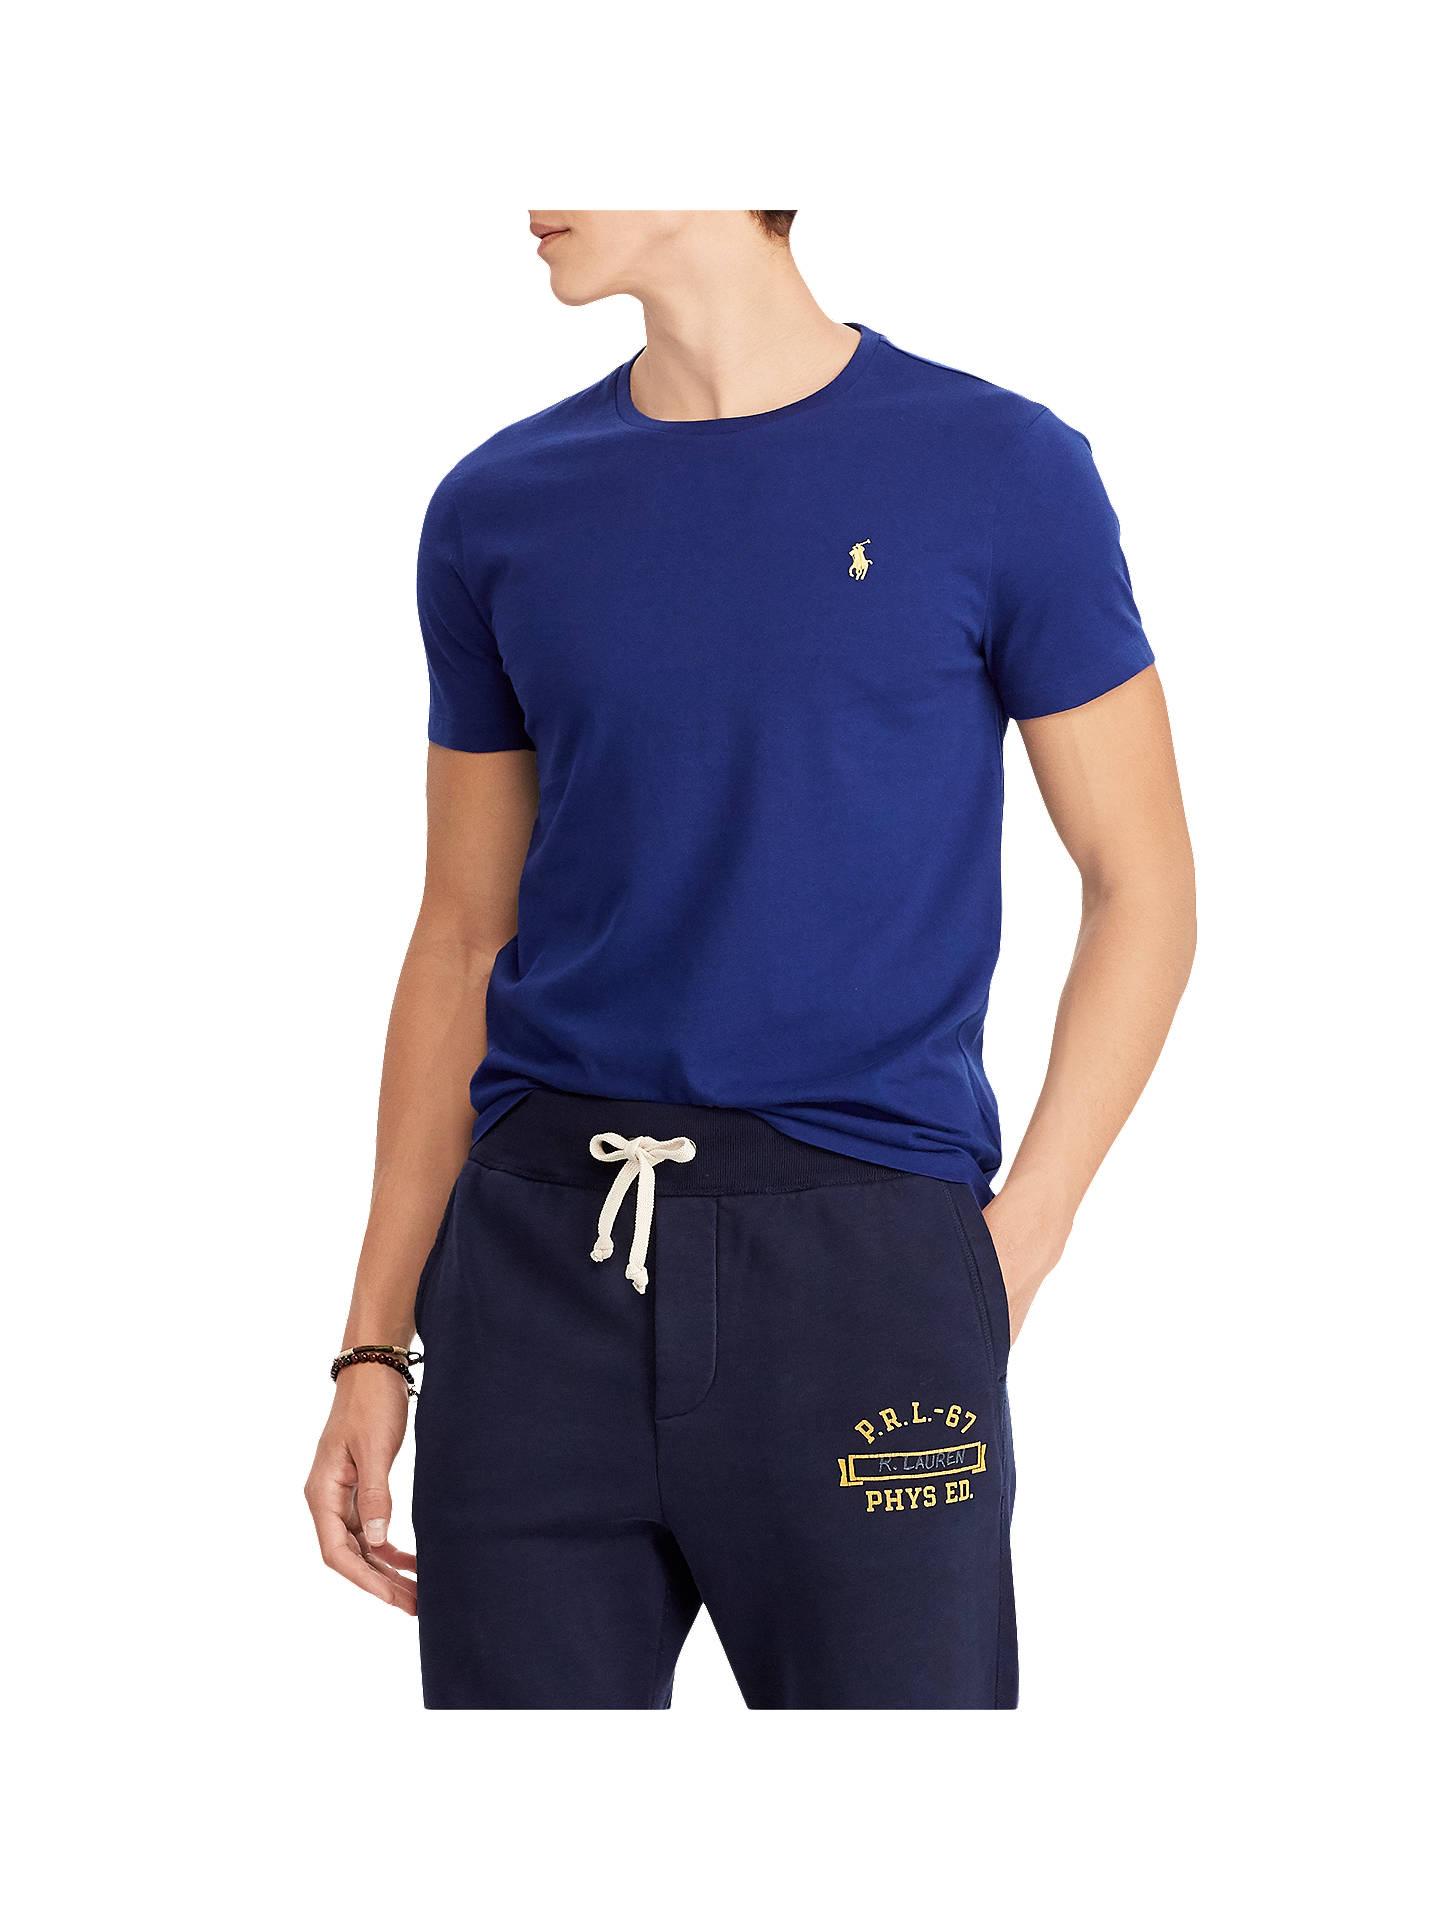 9eb478926ea23 Polo Ralph Lauren Crew Neck T-Shirt at John Lewis   Partners